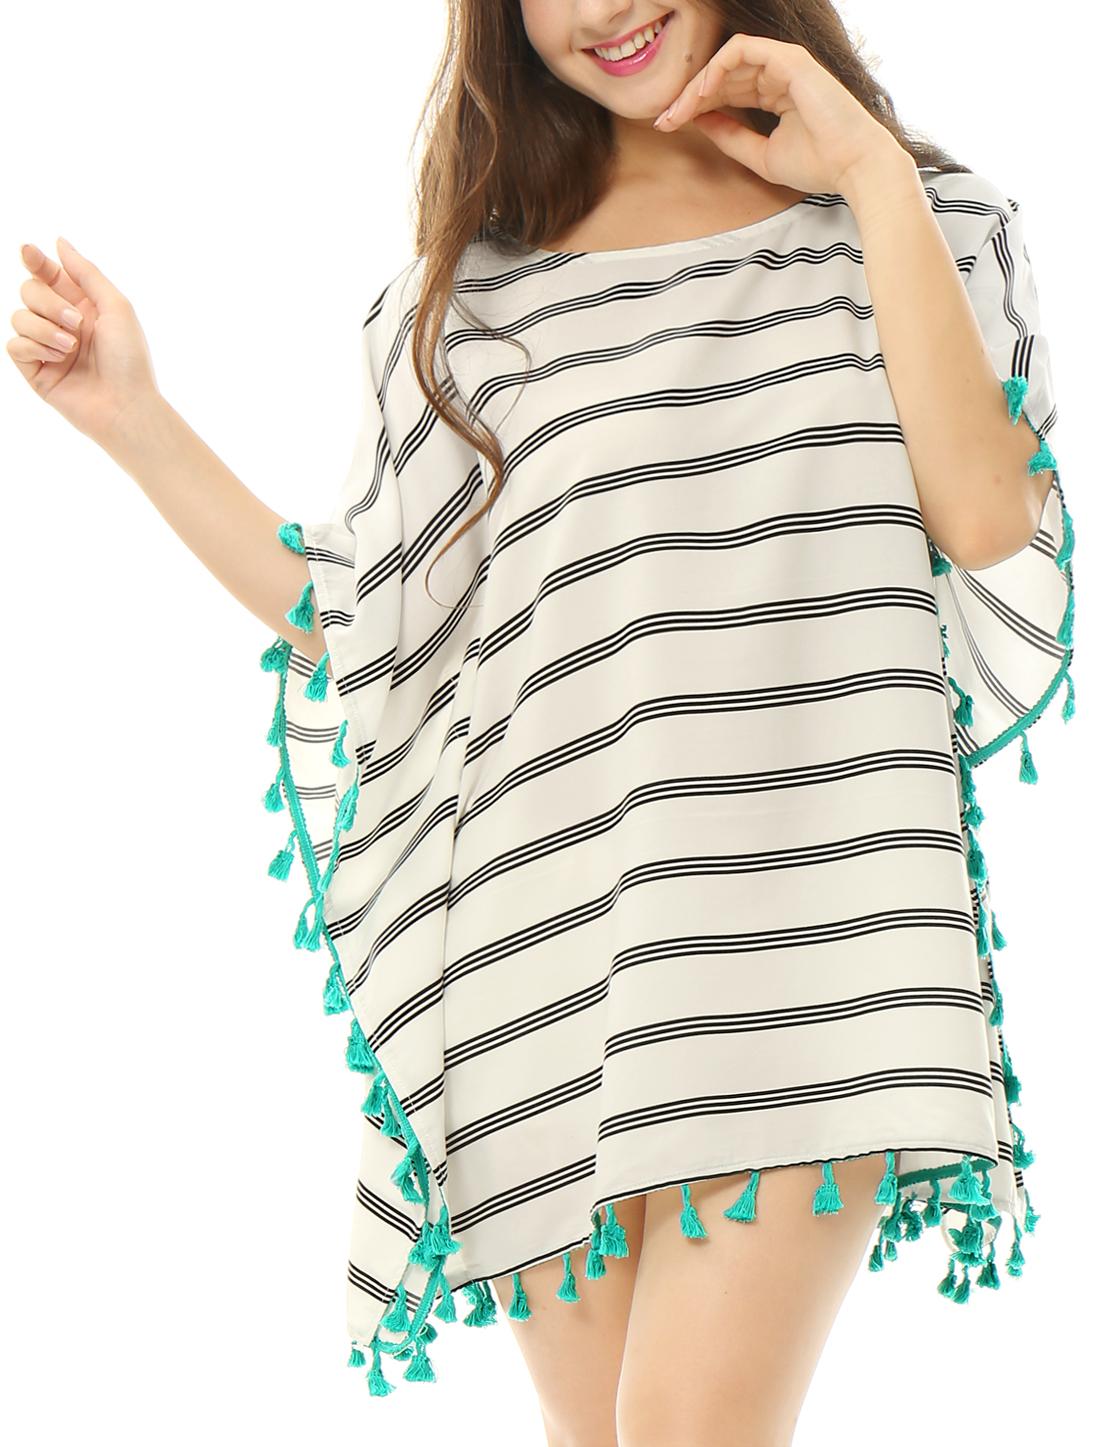 Women Tassel Trim Loose Stripes Cover Up Tunic Top White M